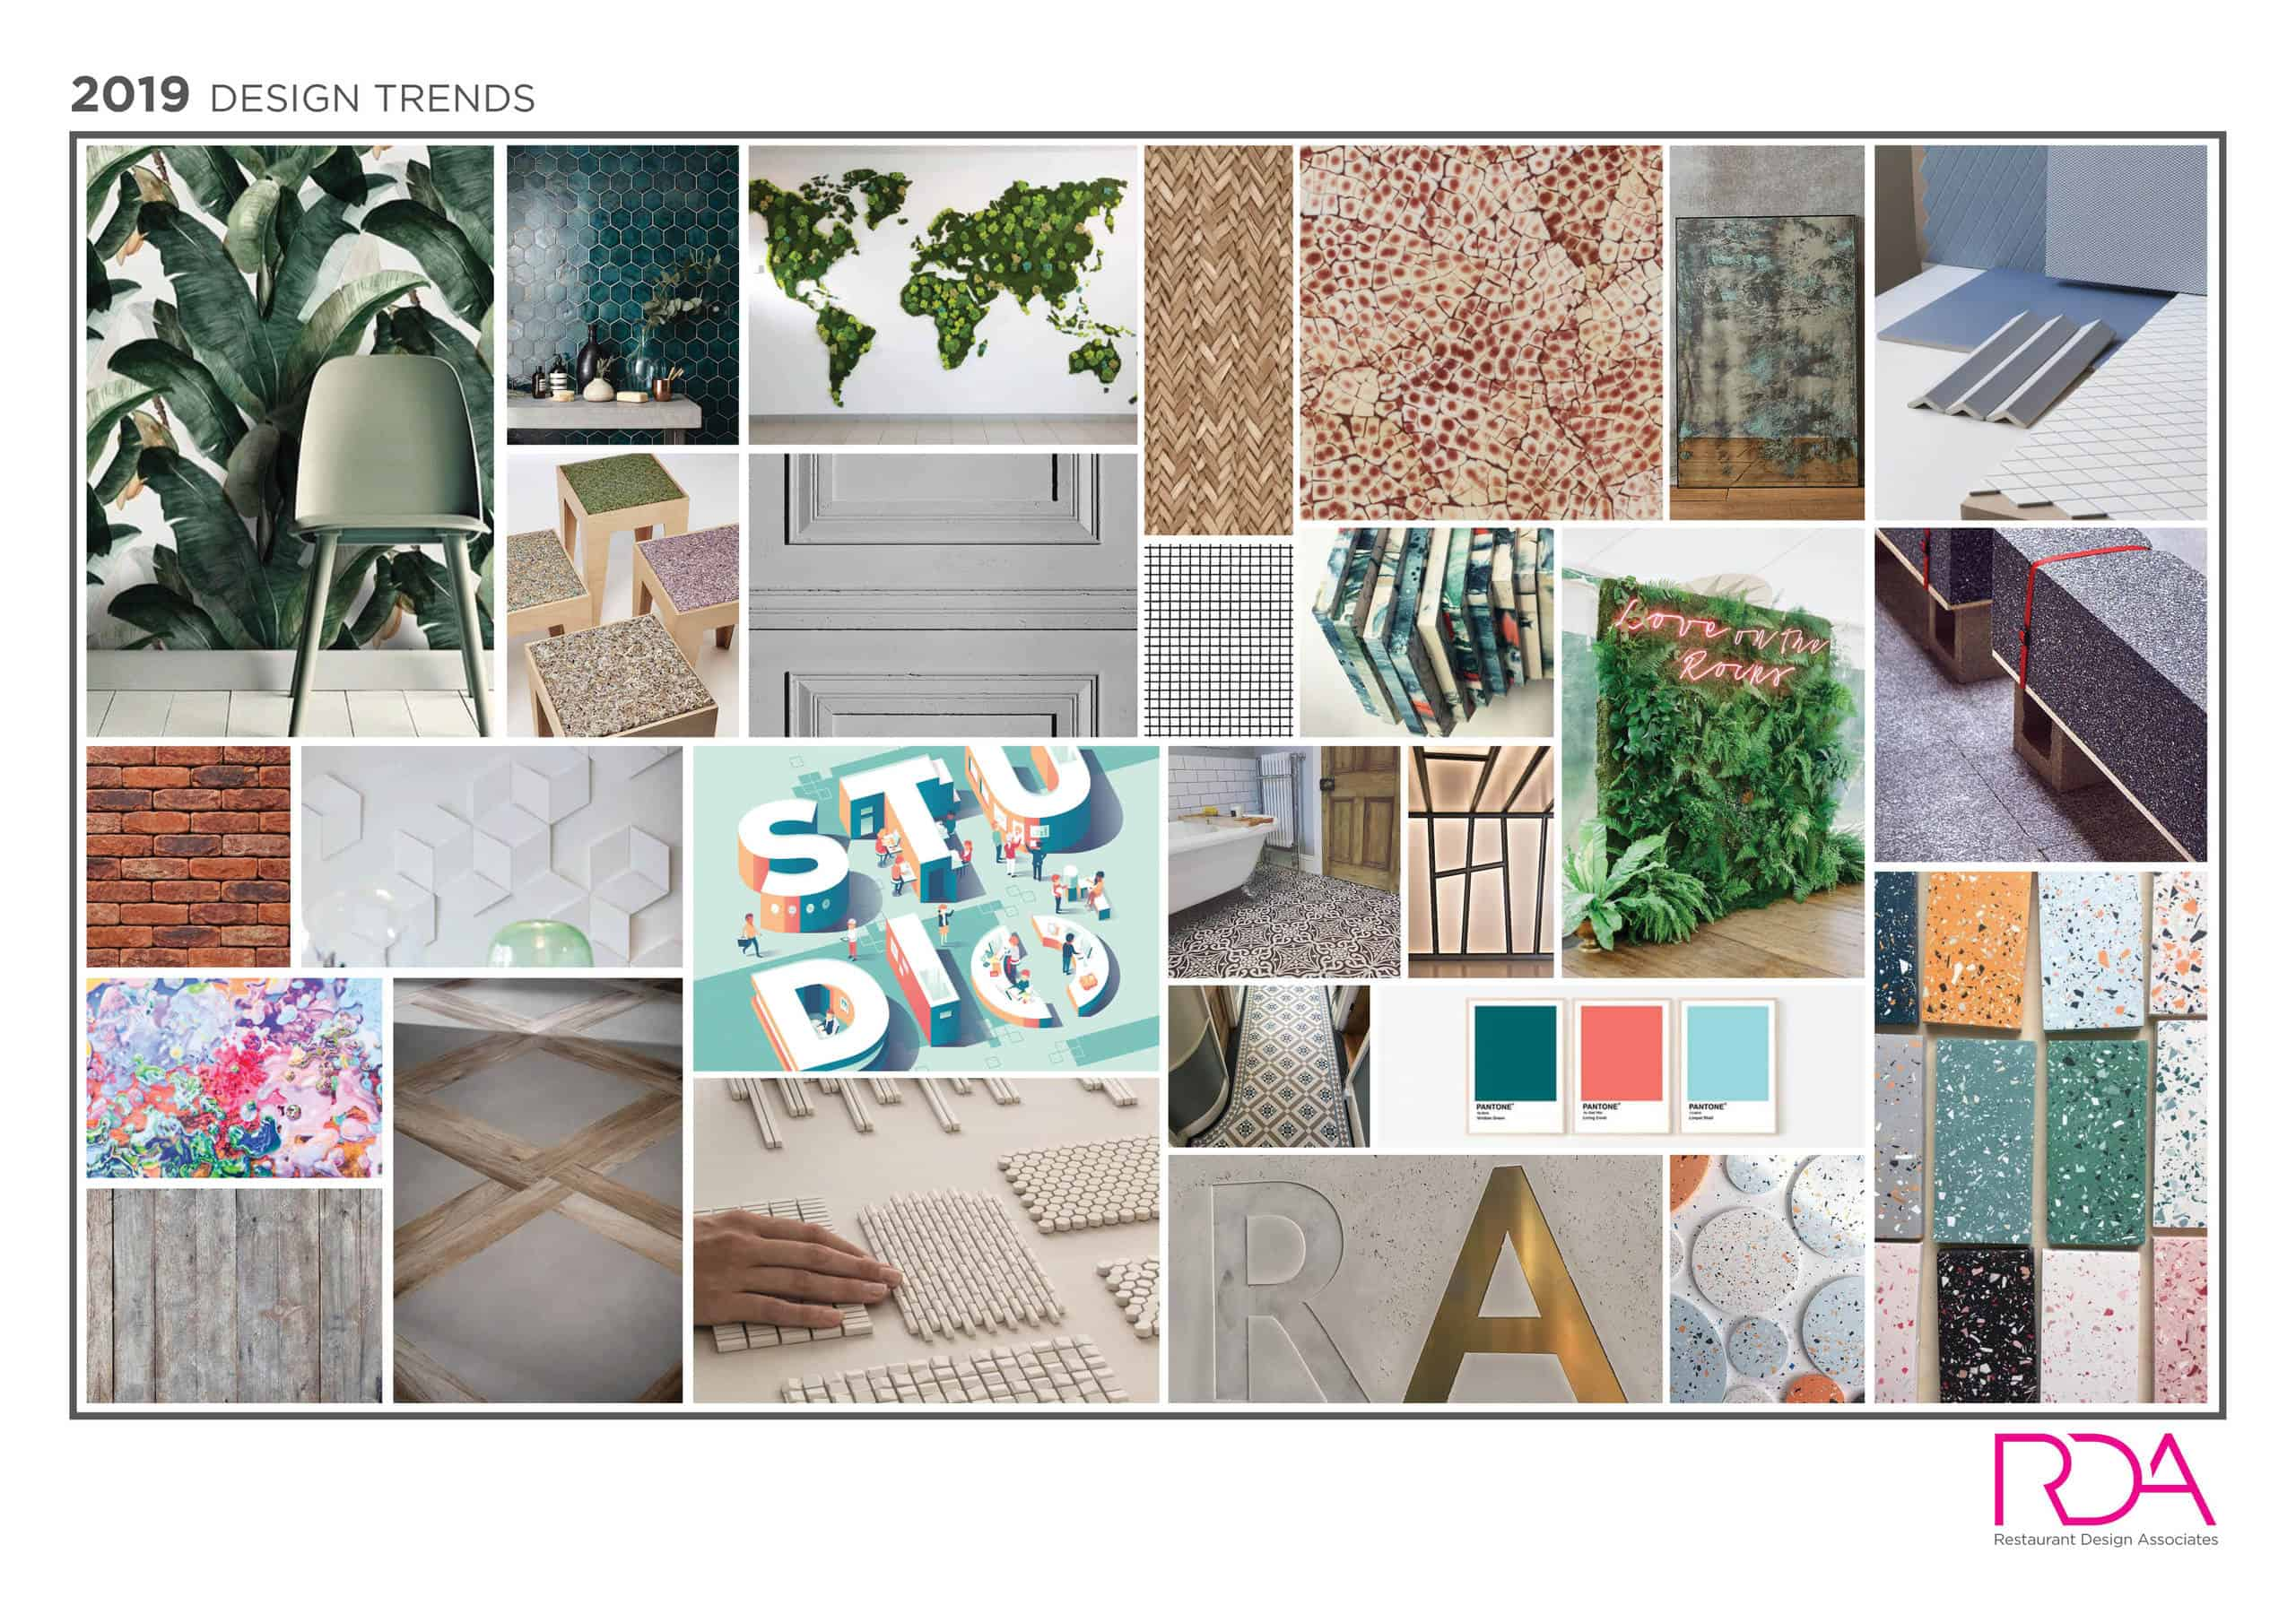 Design Décor Trends to Inspire